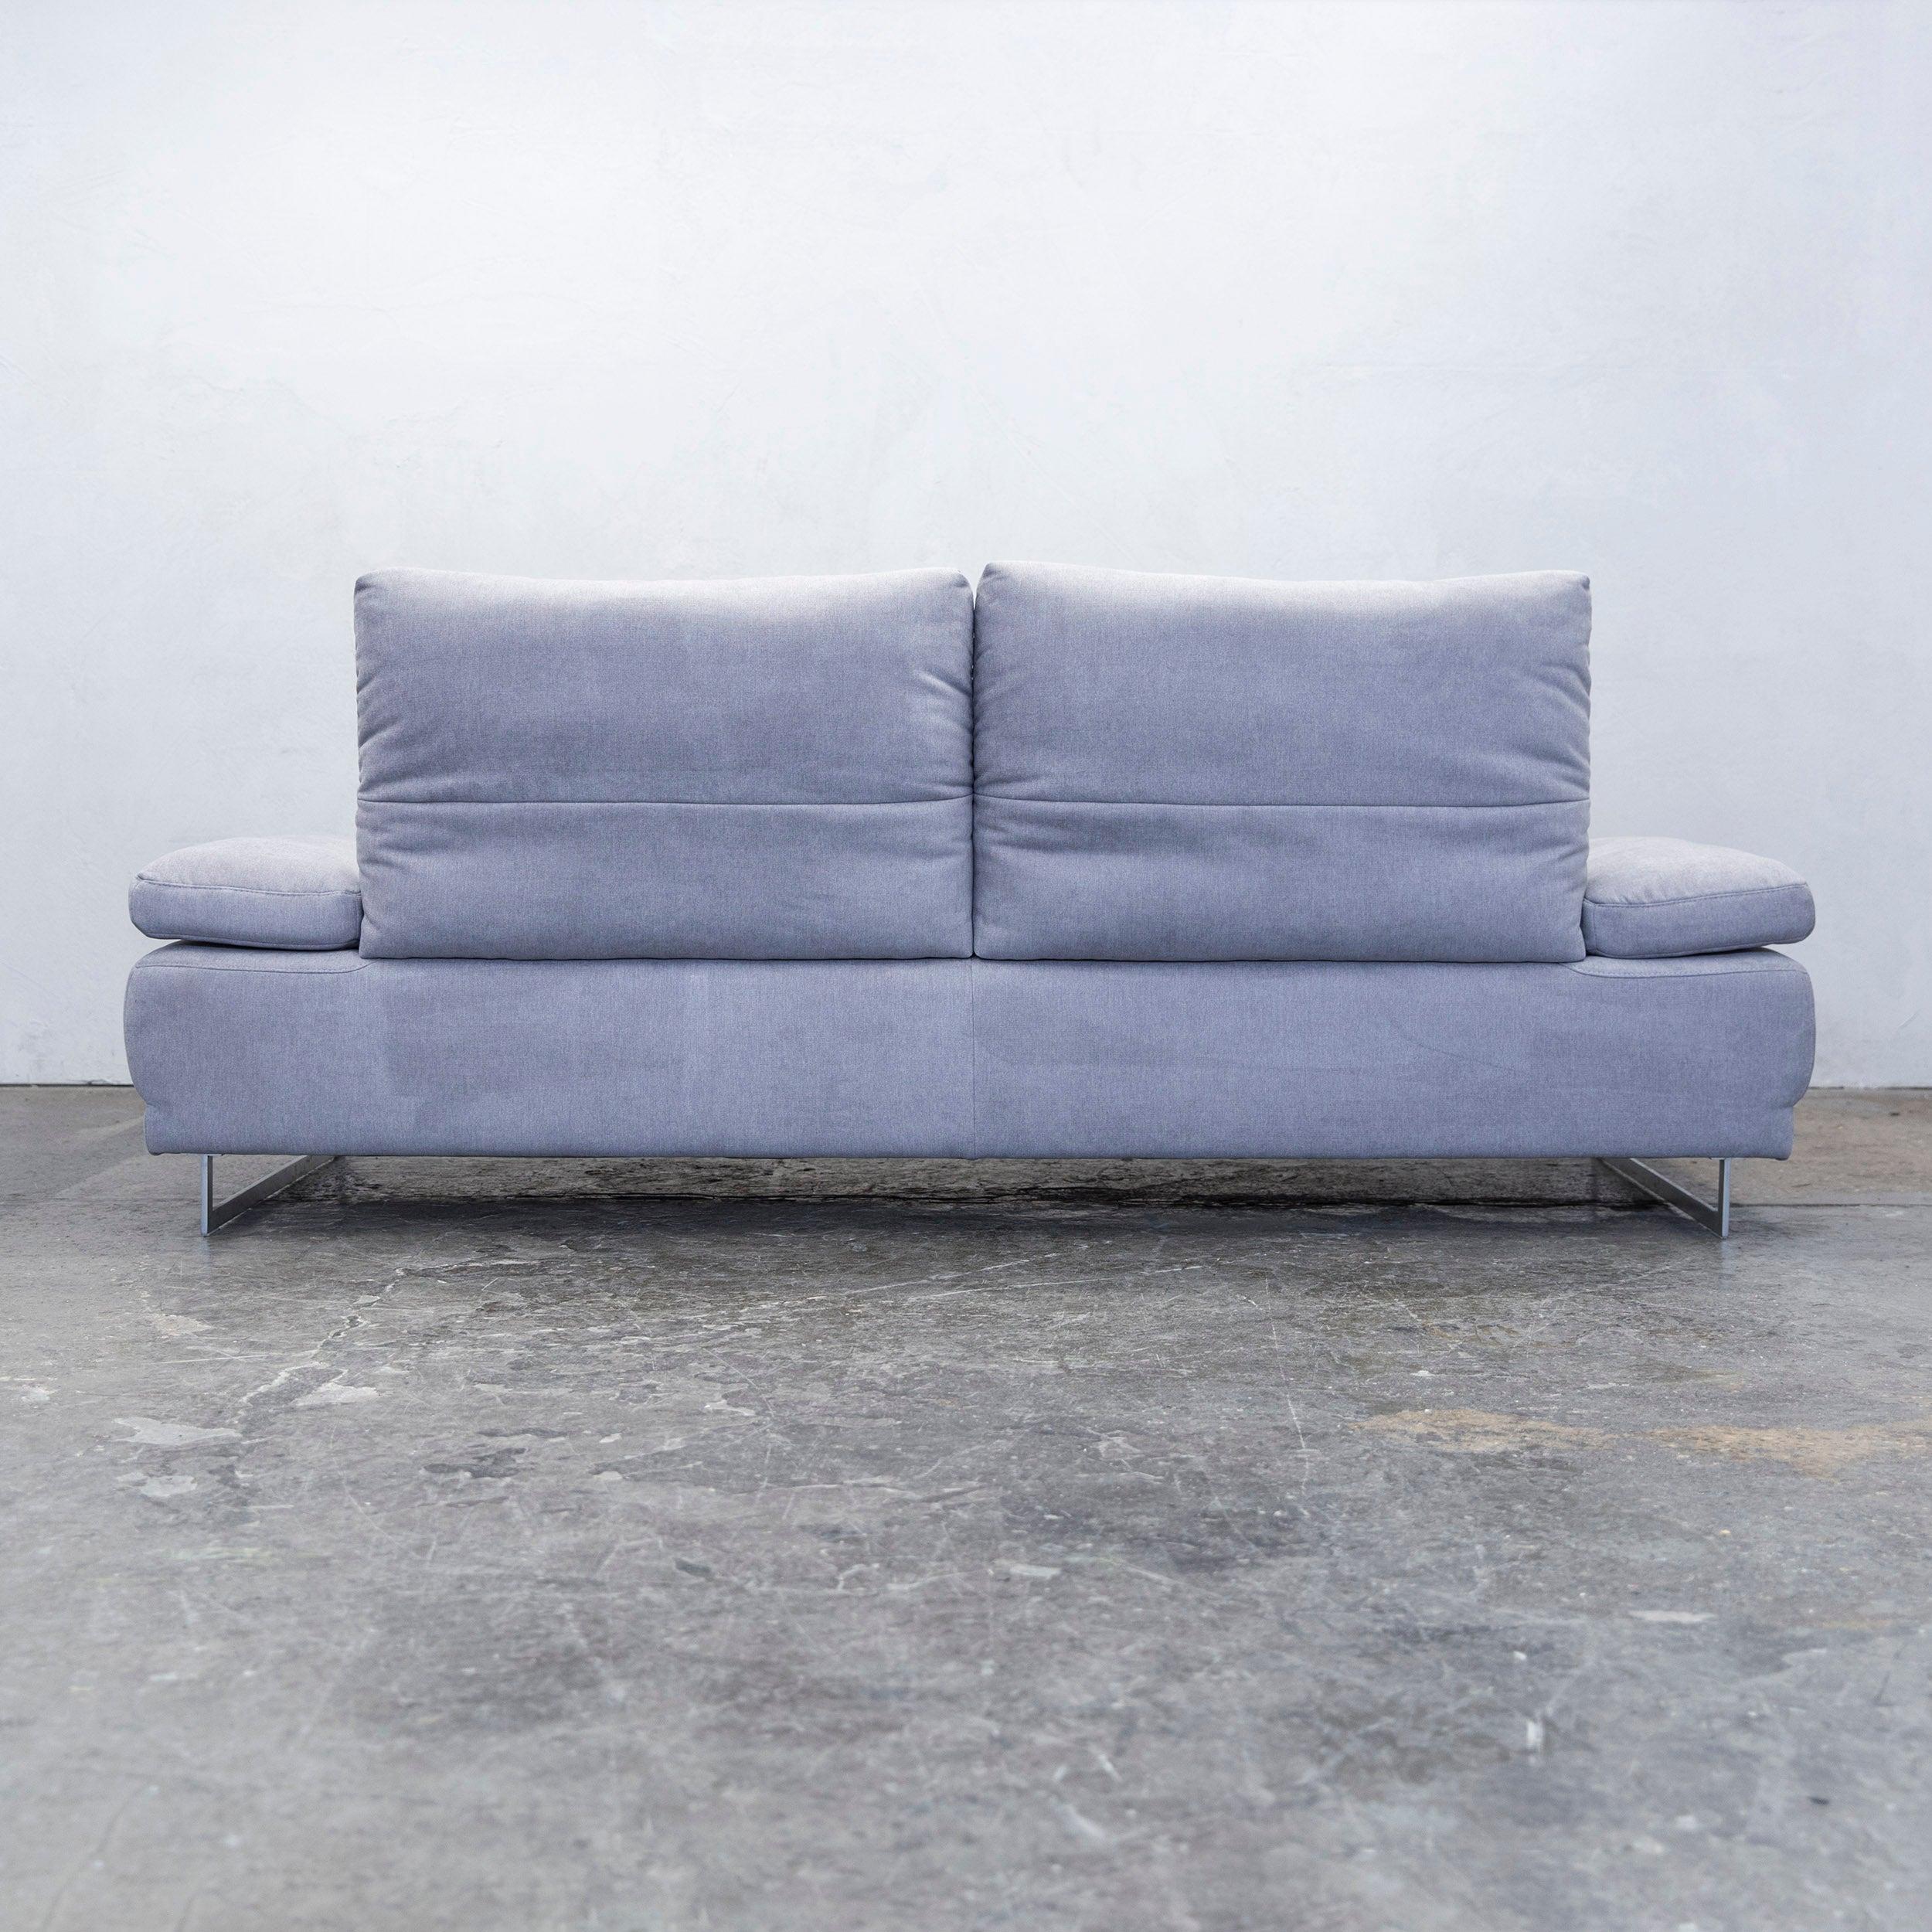 K+W Polstermöbel Designer Leather Sofa Fabric Grey Thre-Seat Couch ...